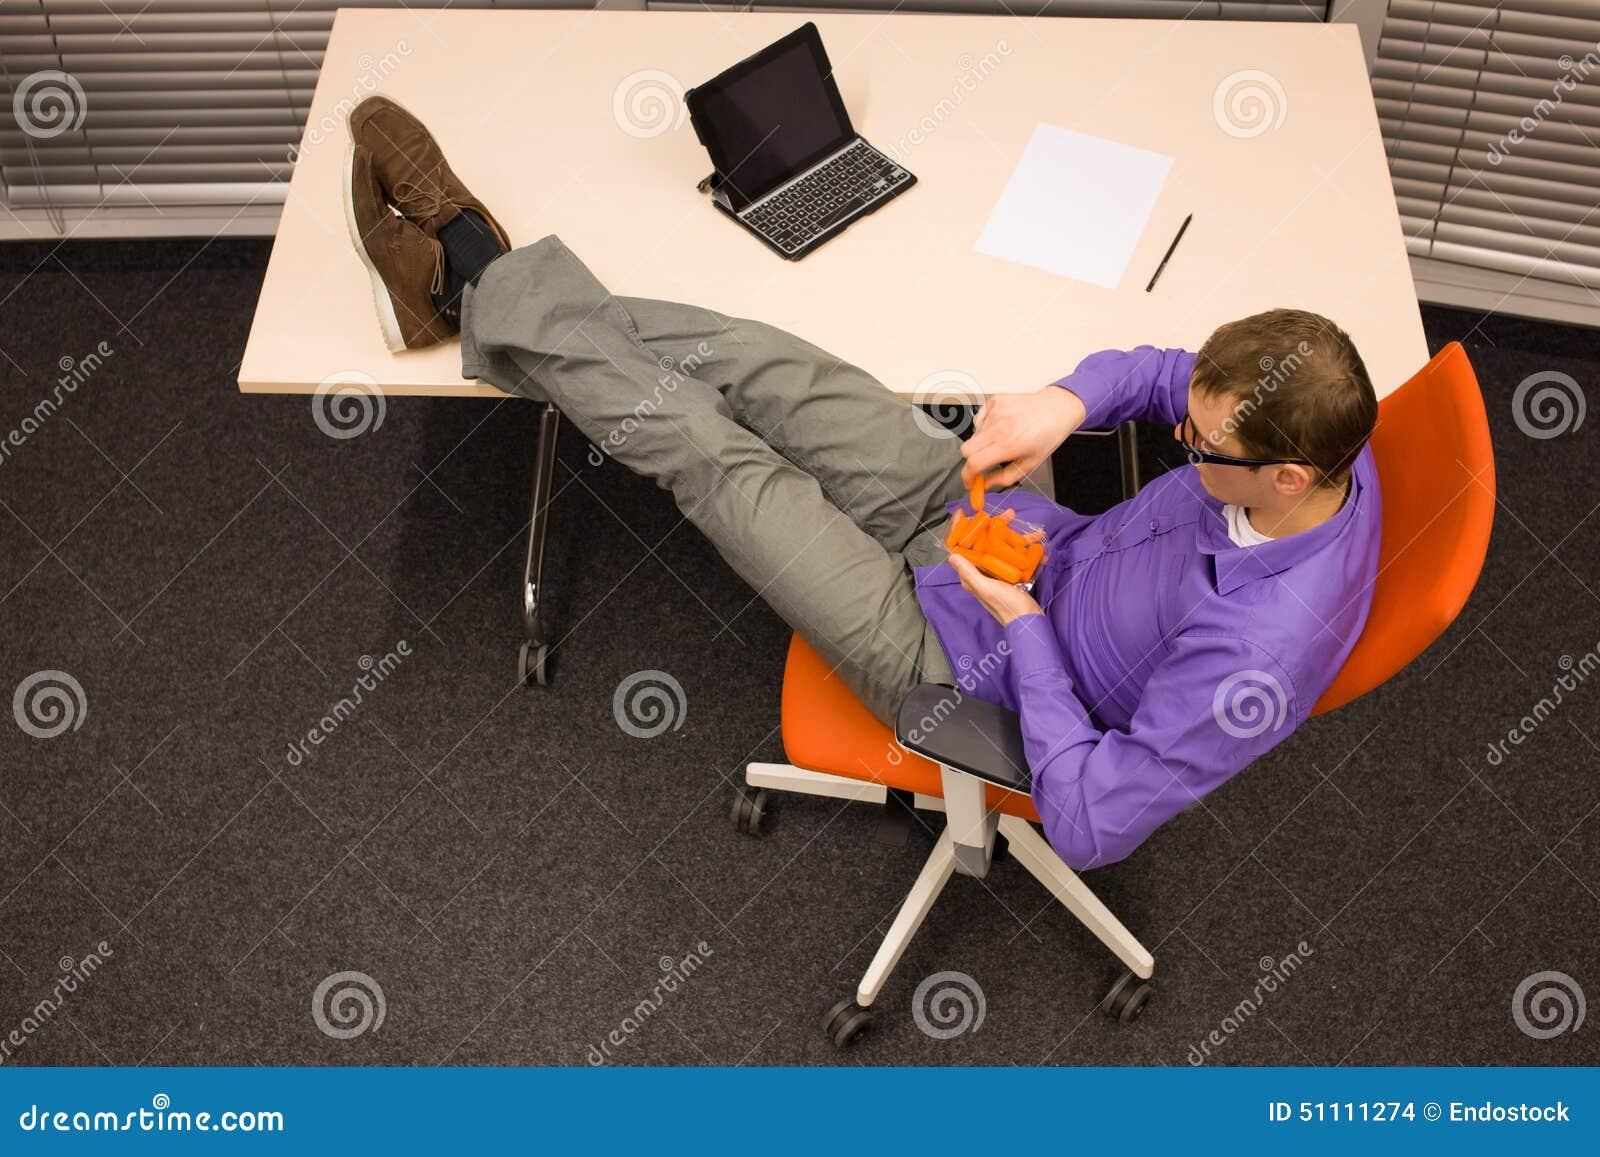 Cenoura antropófaga no escritório